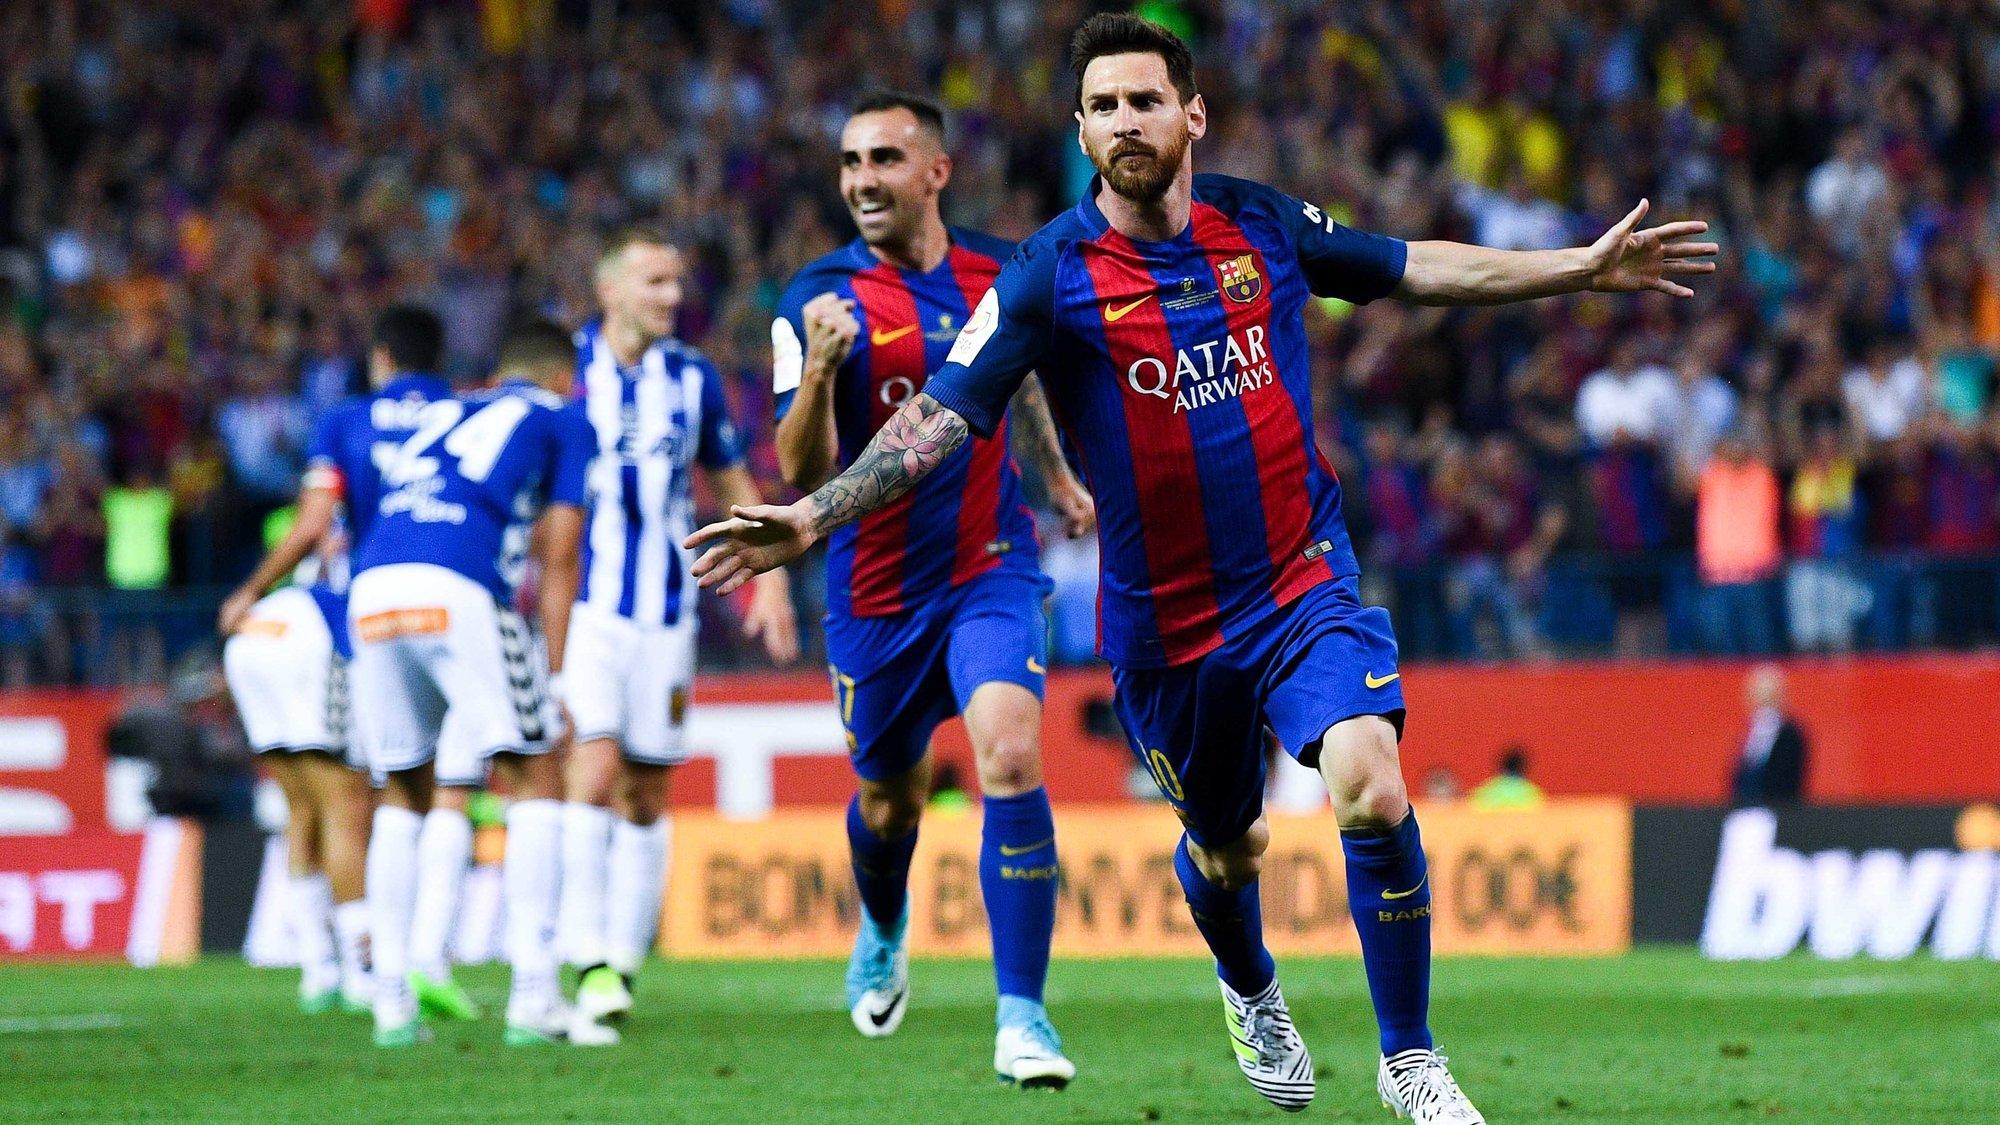 ФК «Барселона» одержал победу Кубок Испании